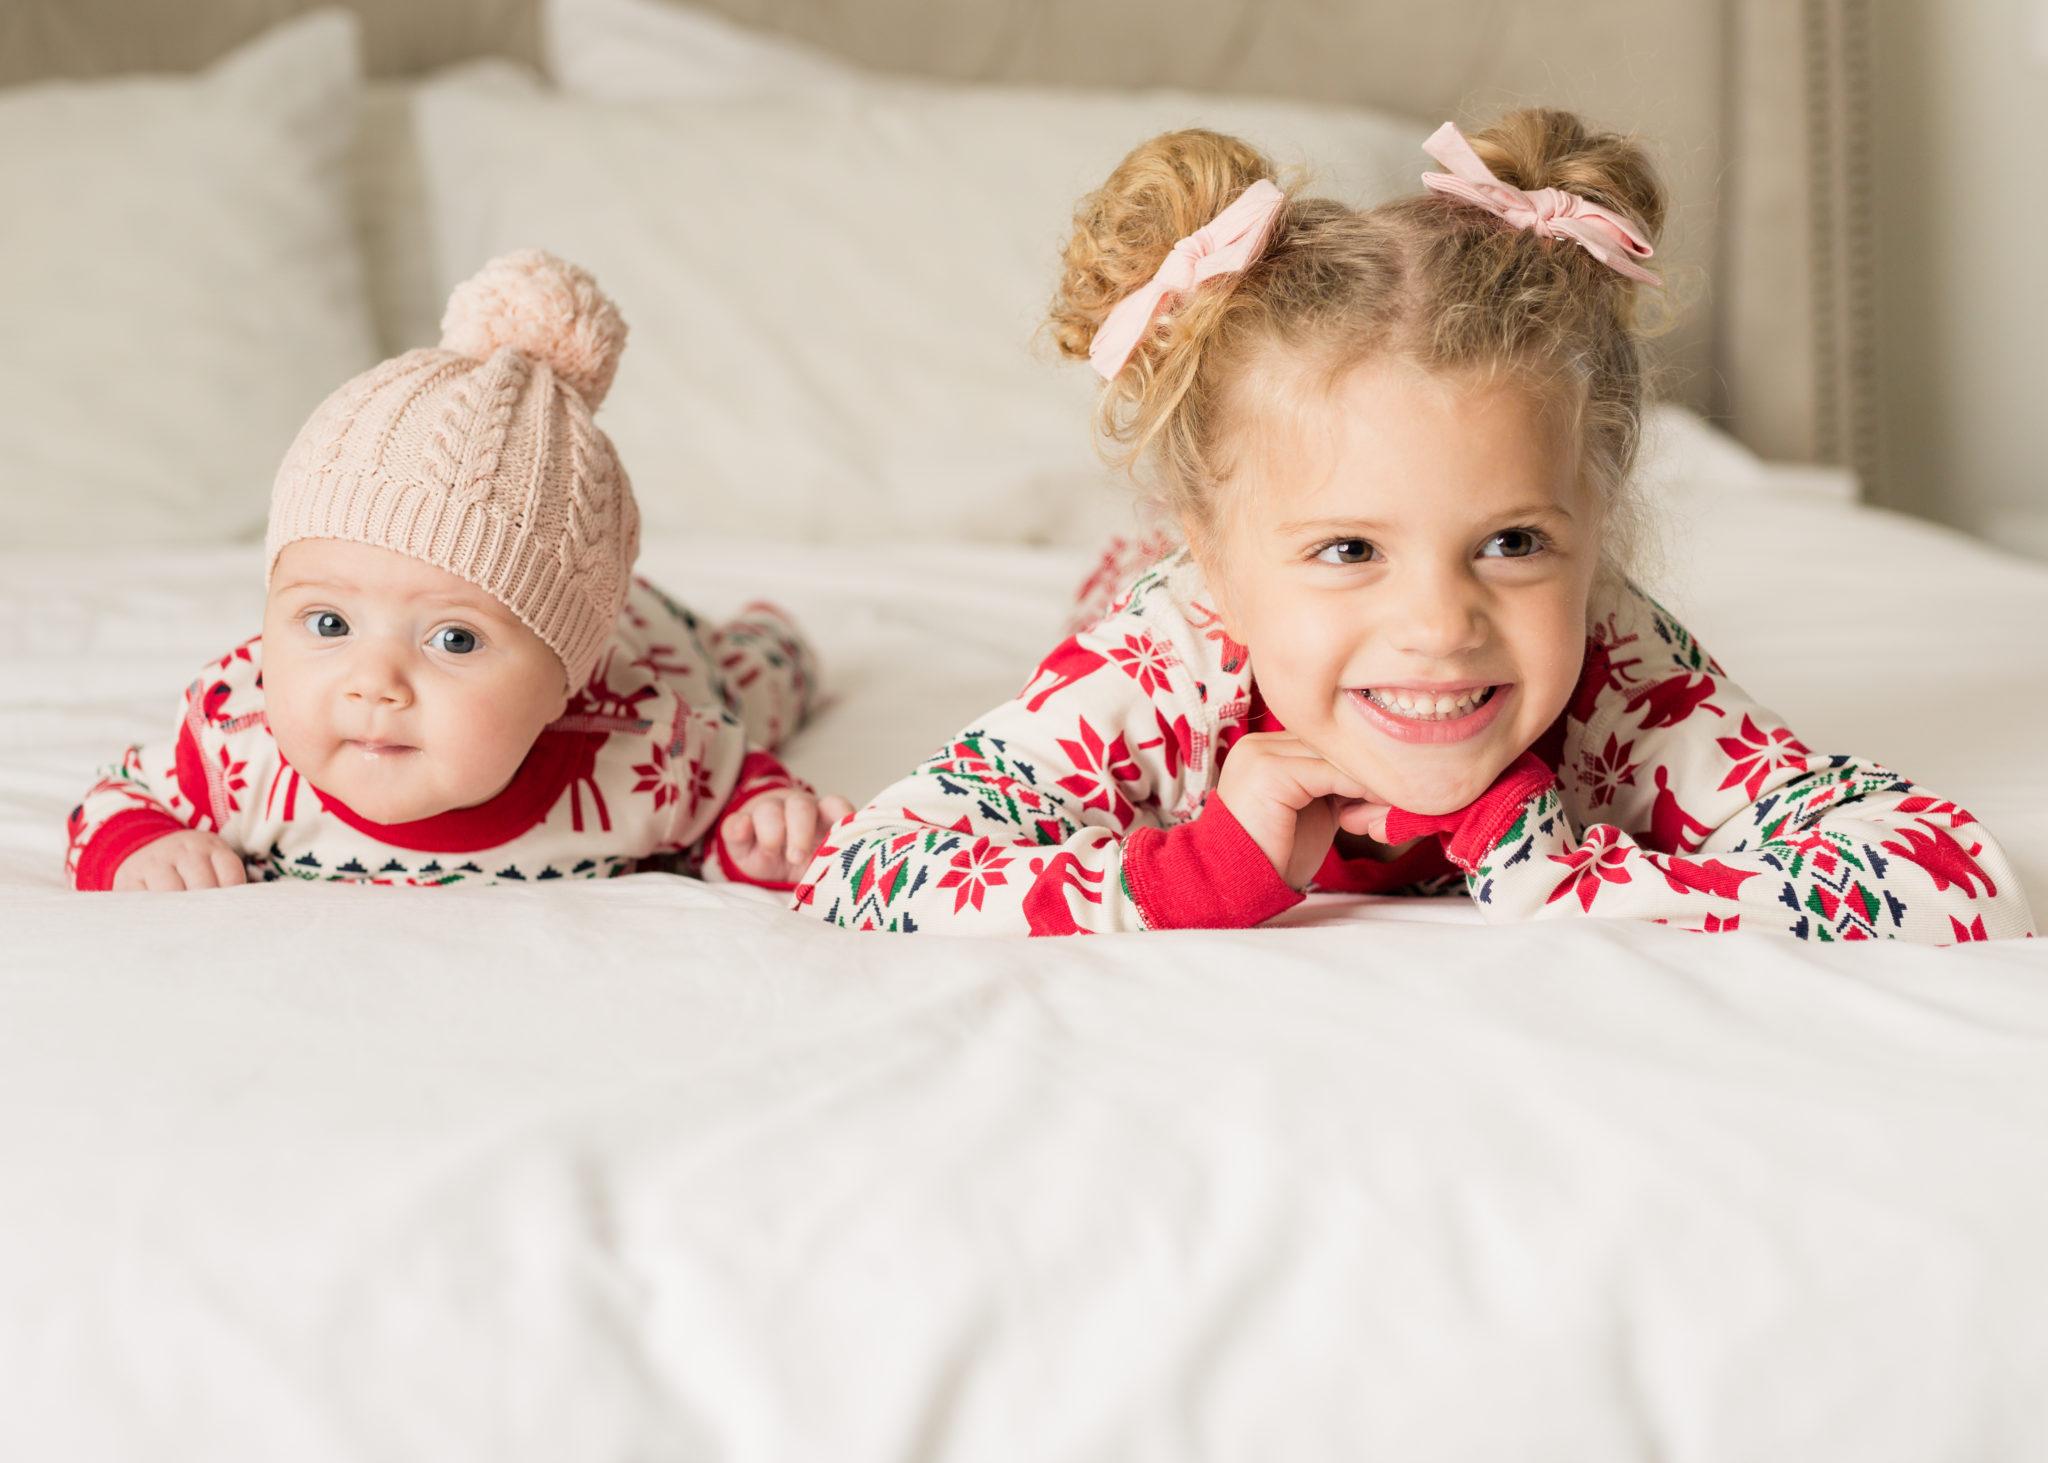 hanna andersson family matching holiday christmas pajamas 2018